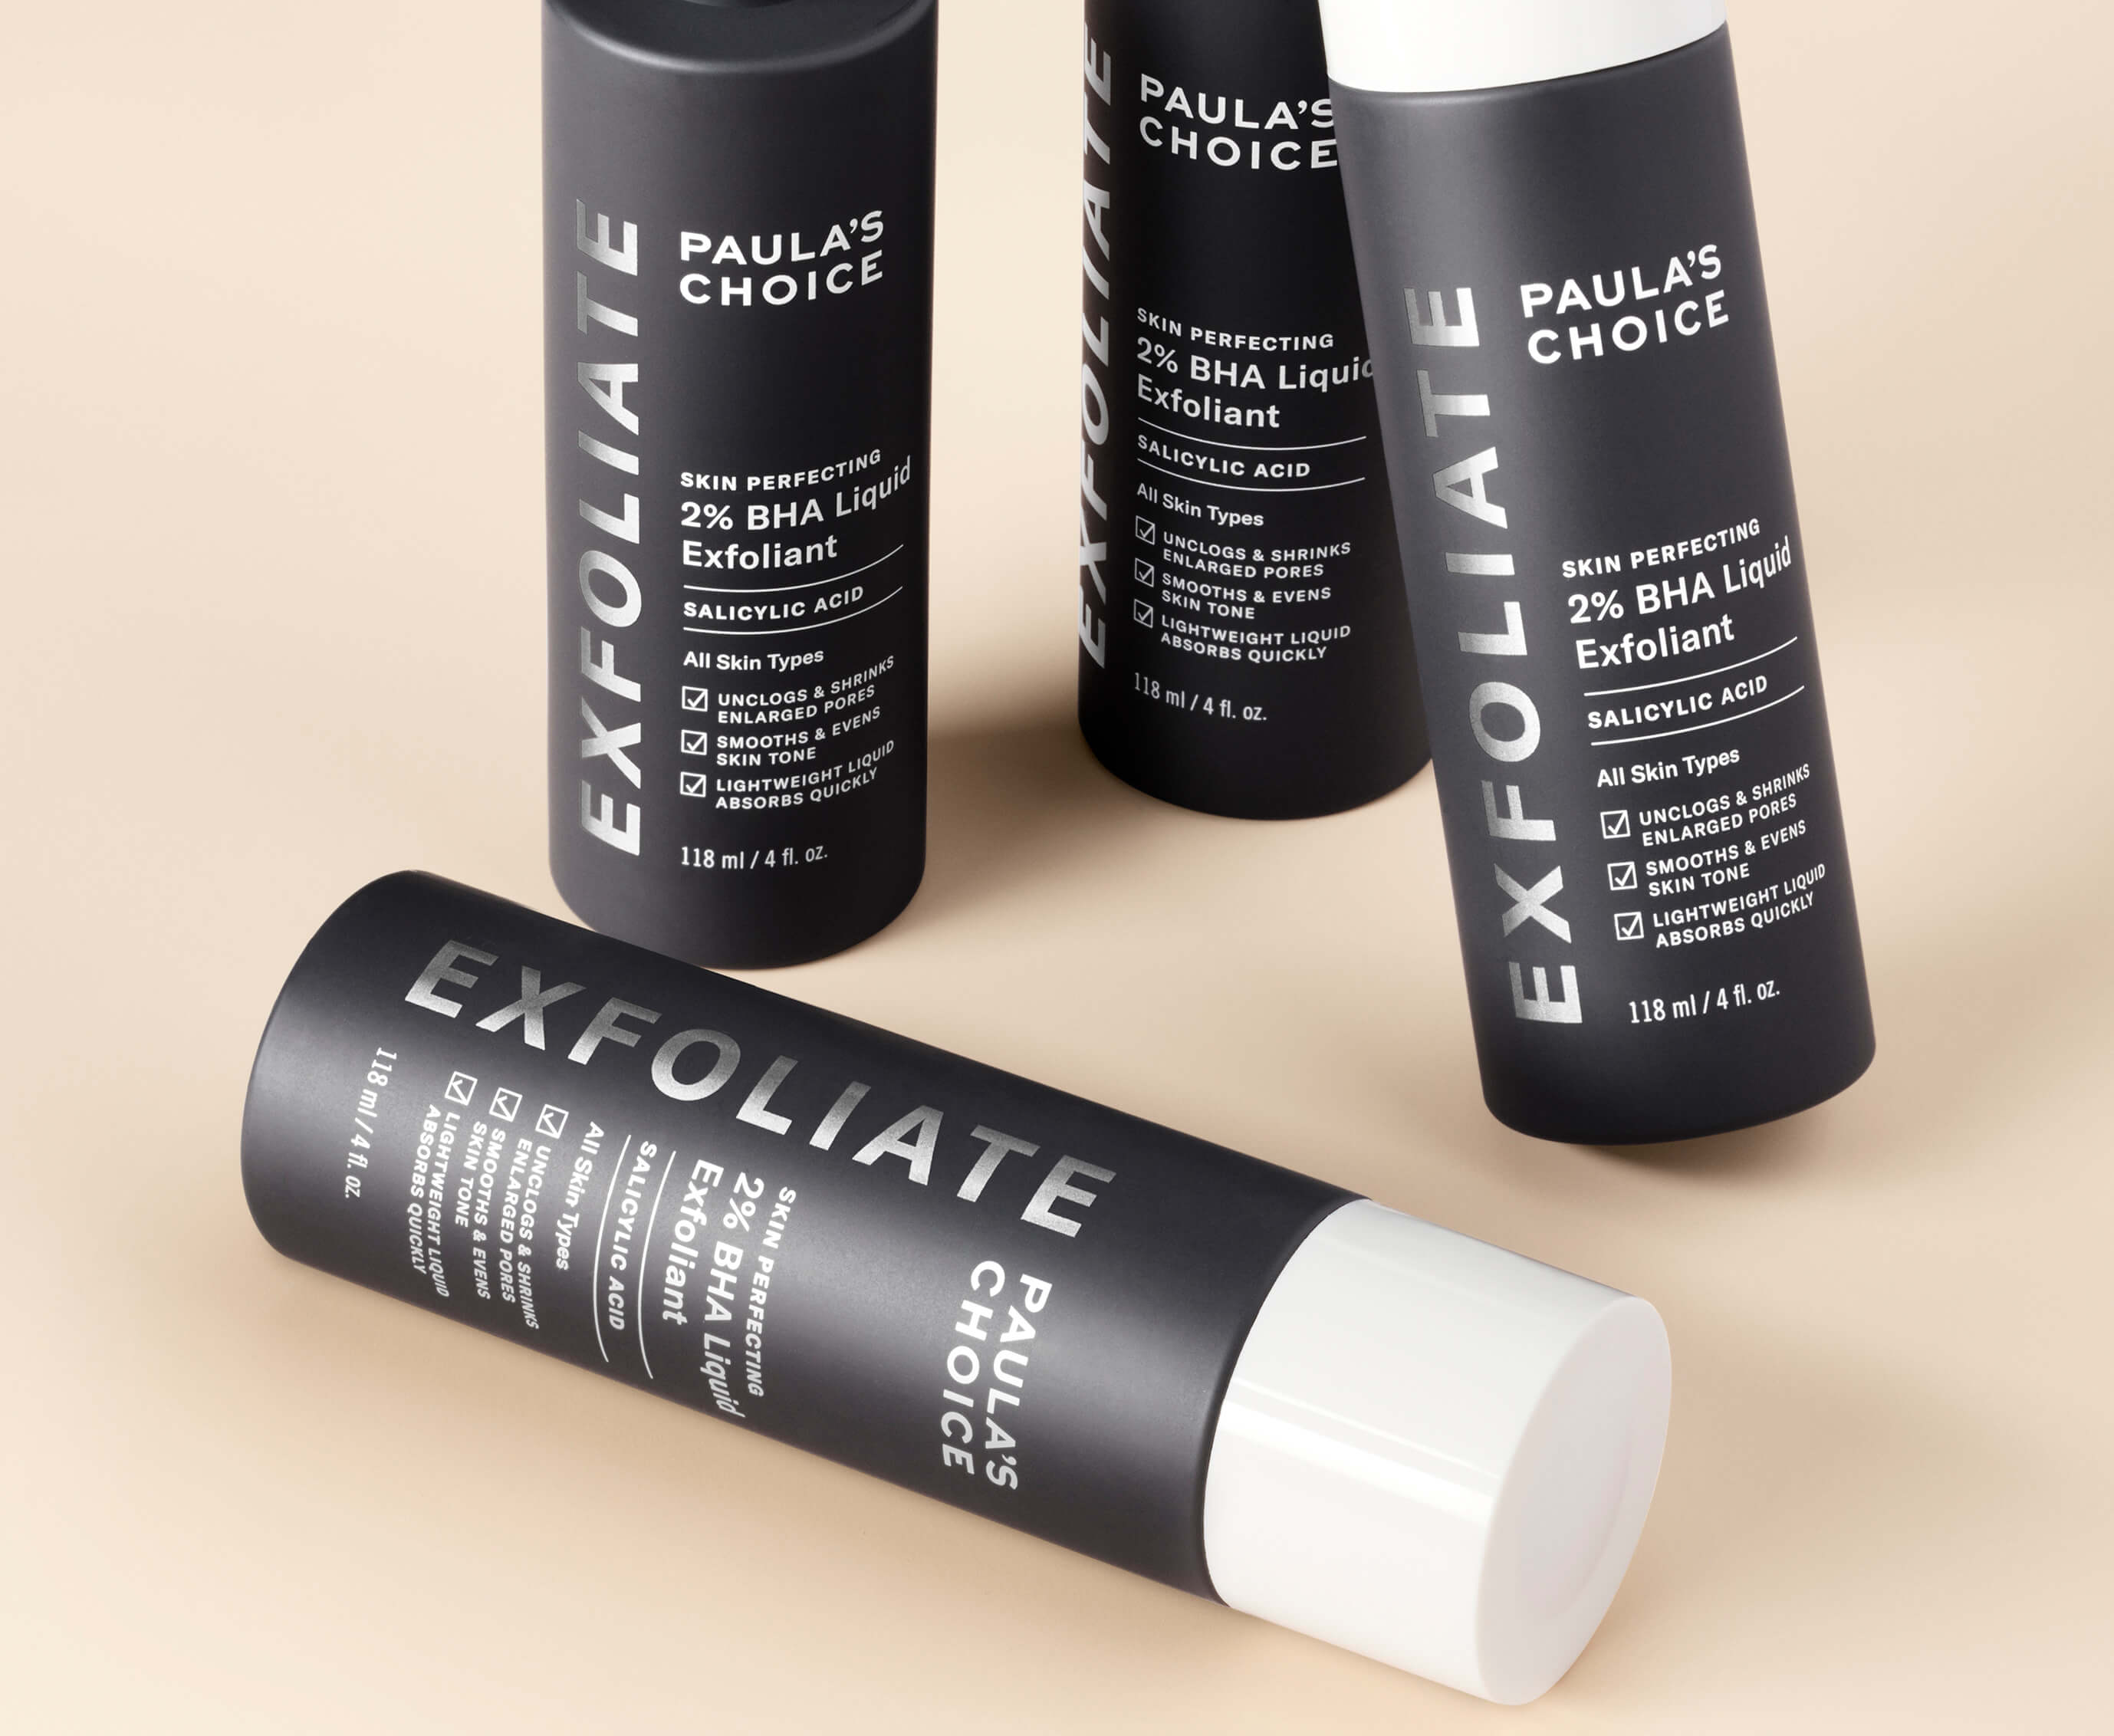 Paula's Choice Skin Perfecting Liquid Exfoliant